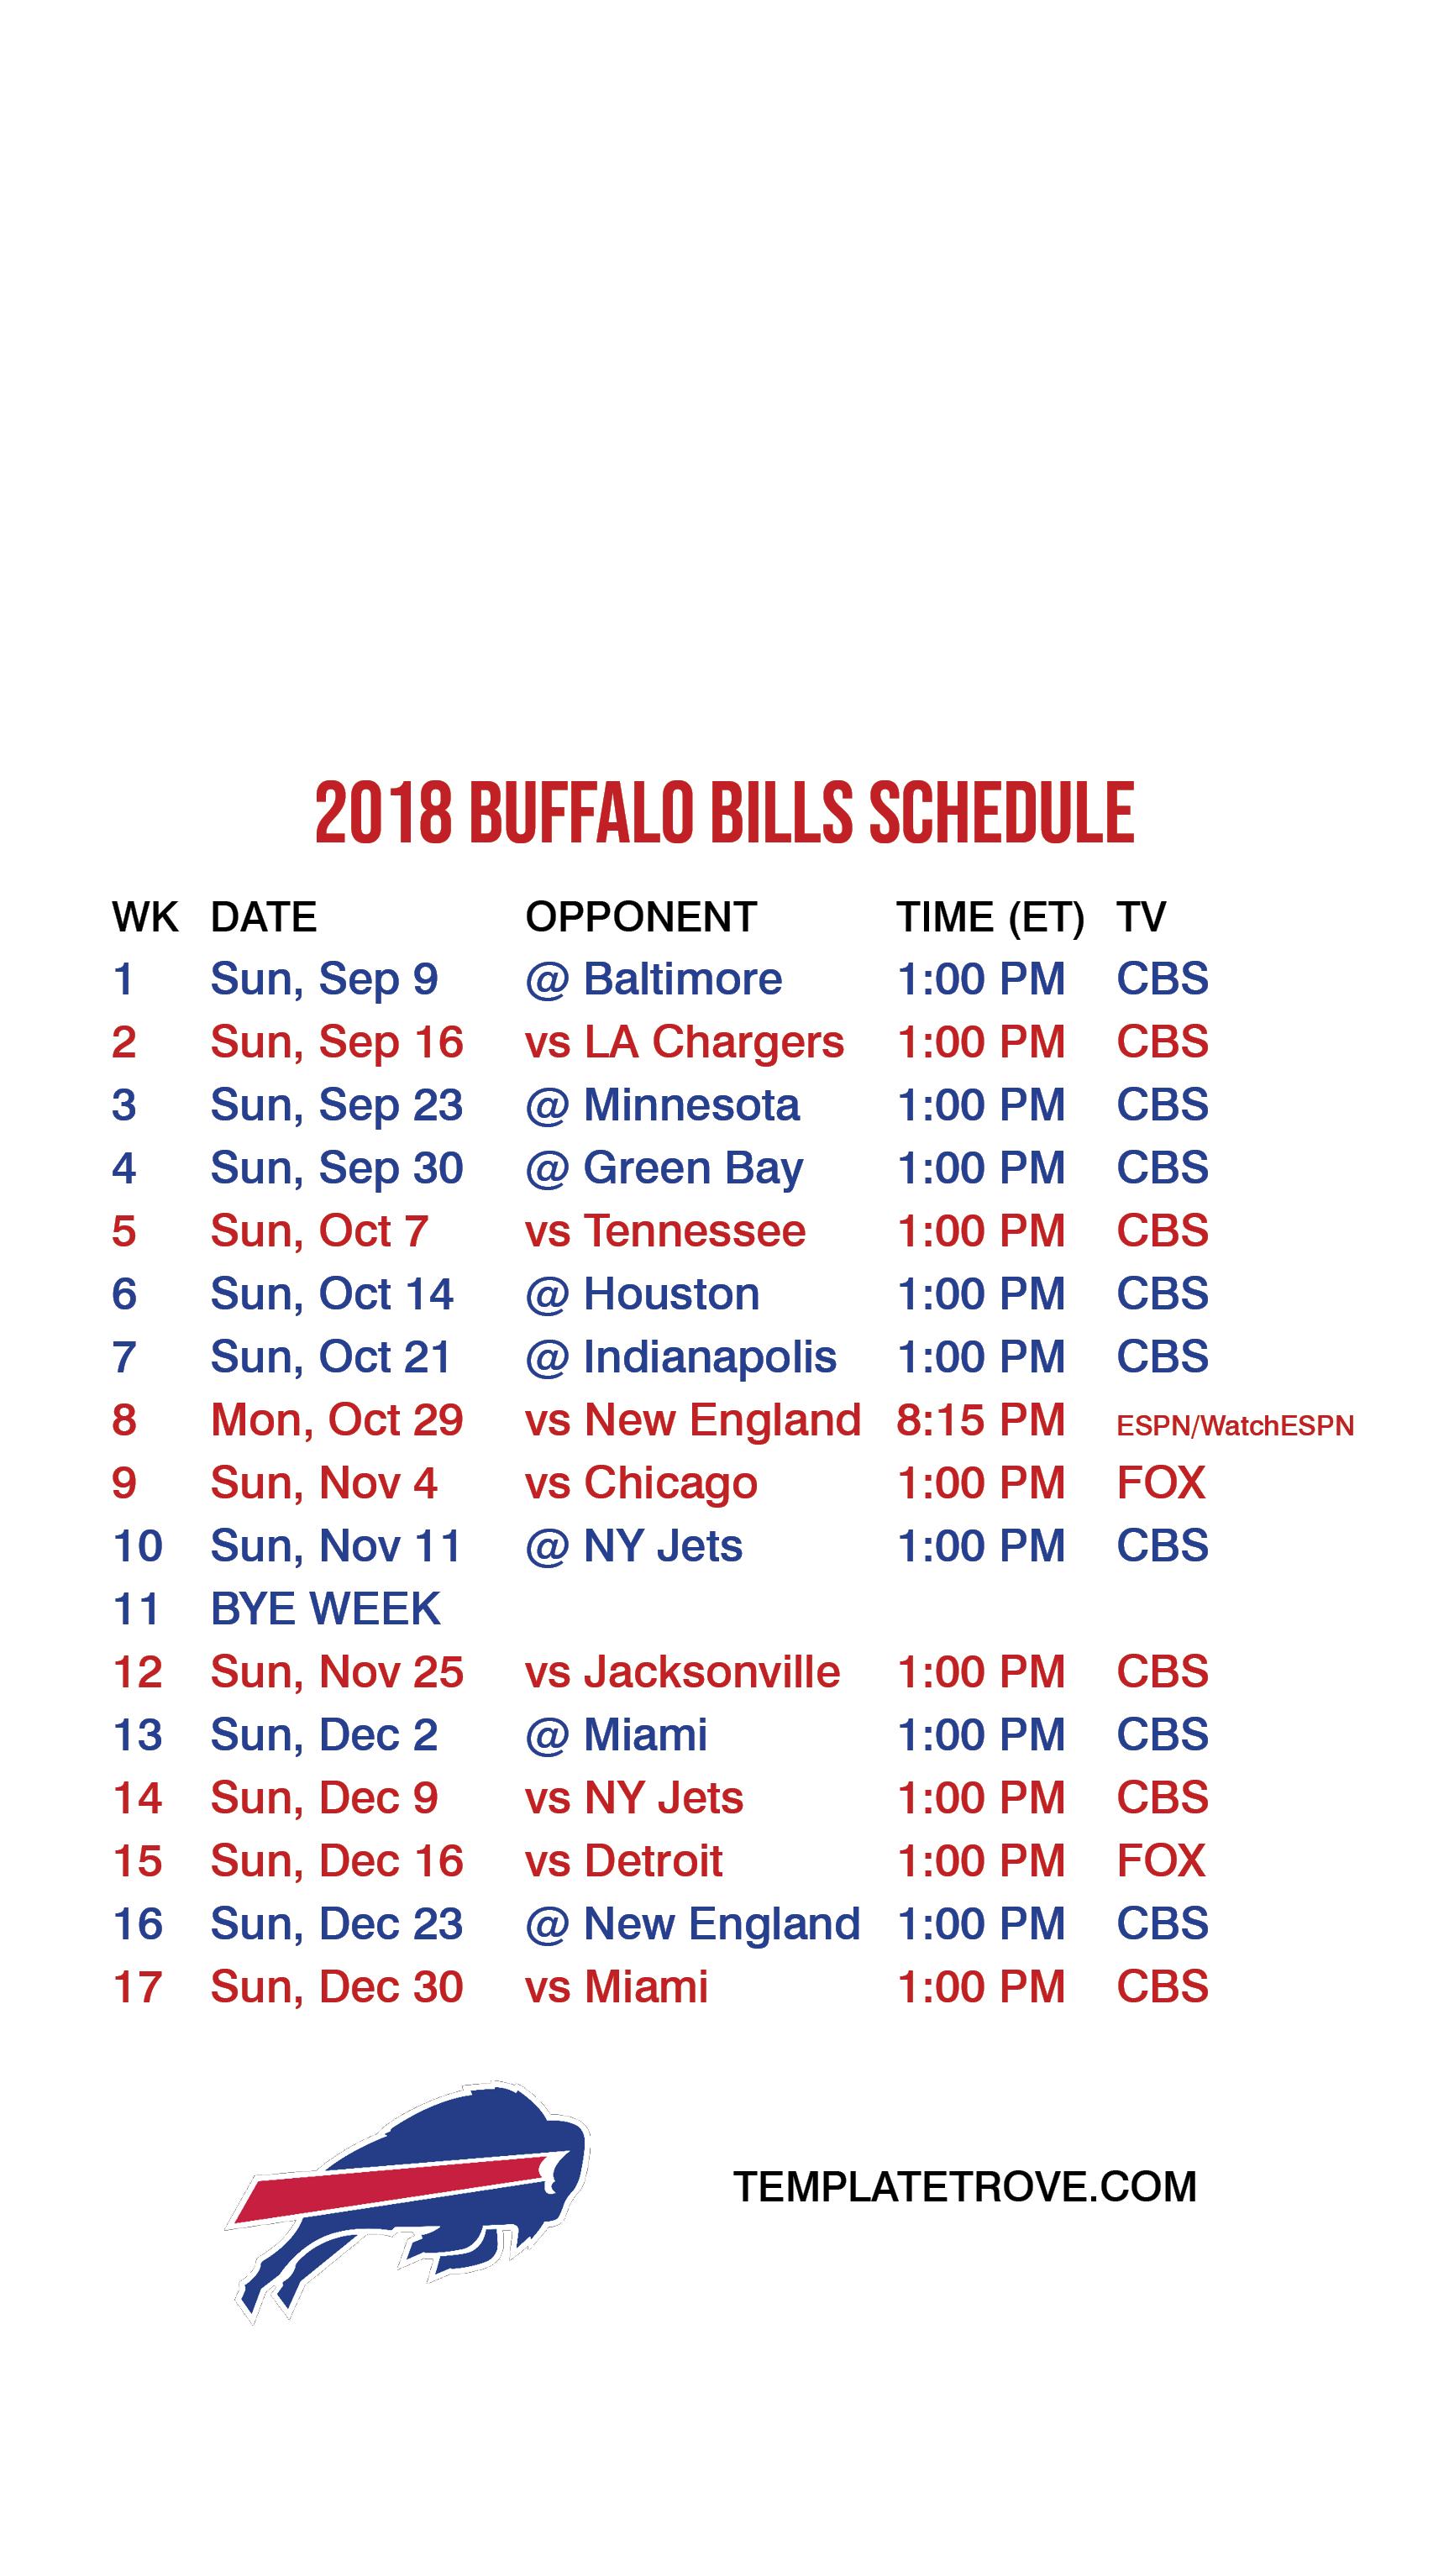 2018-2019 Buffalo Bills Lock Screen Schedule For Iphone 6-7